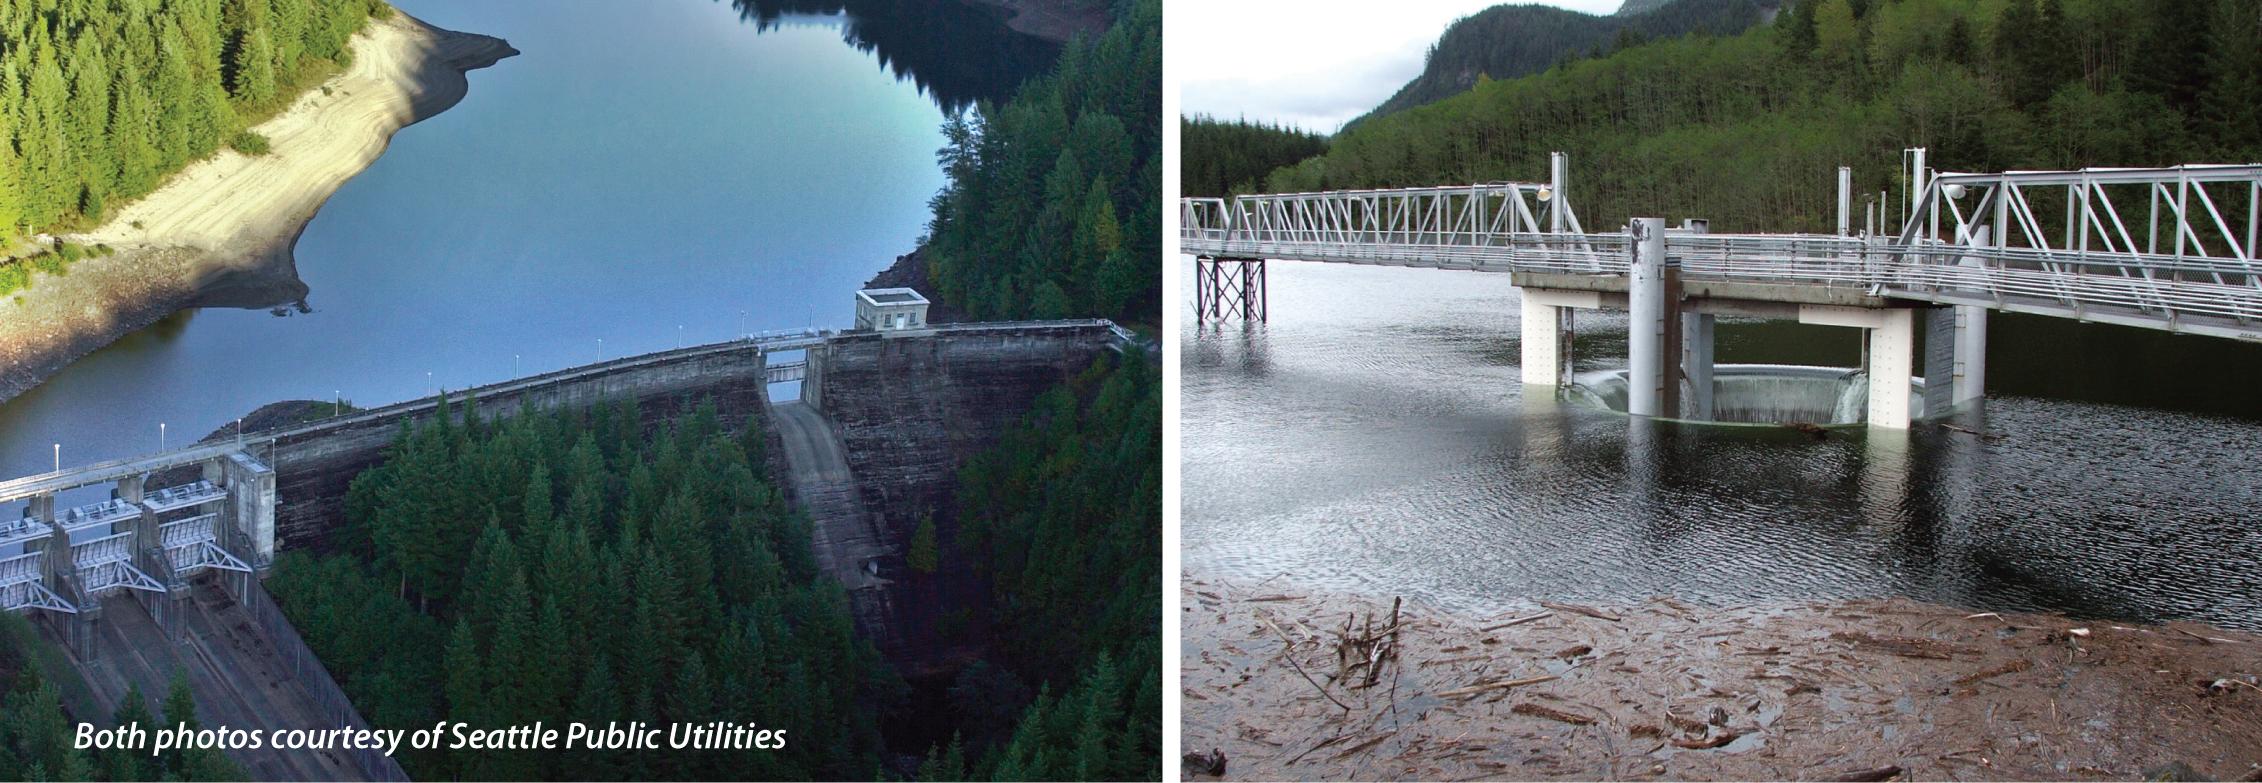 Water shortage photos